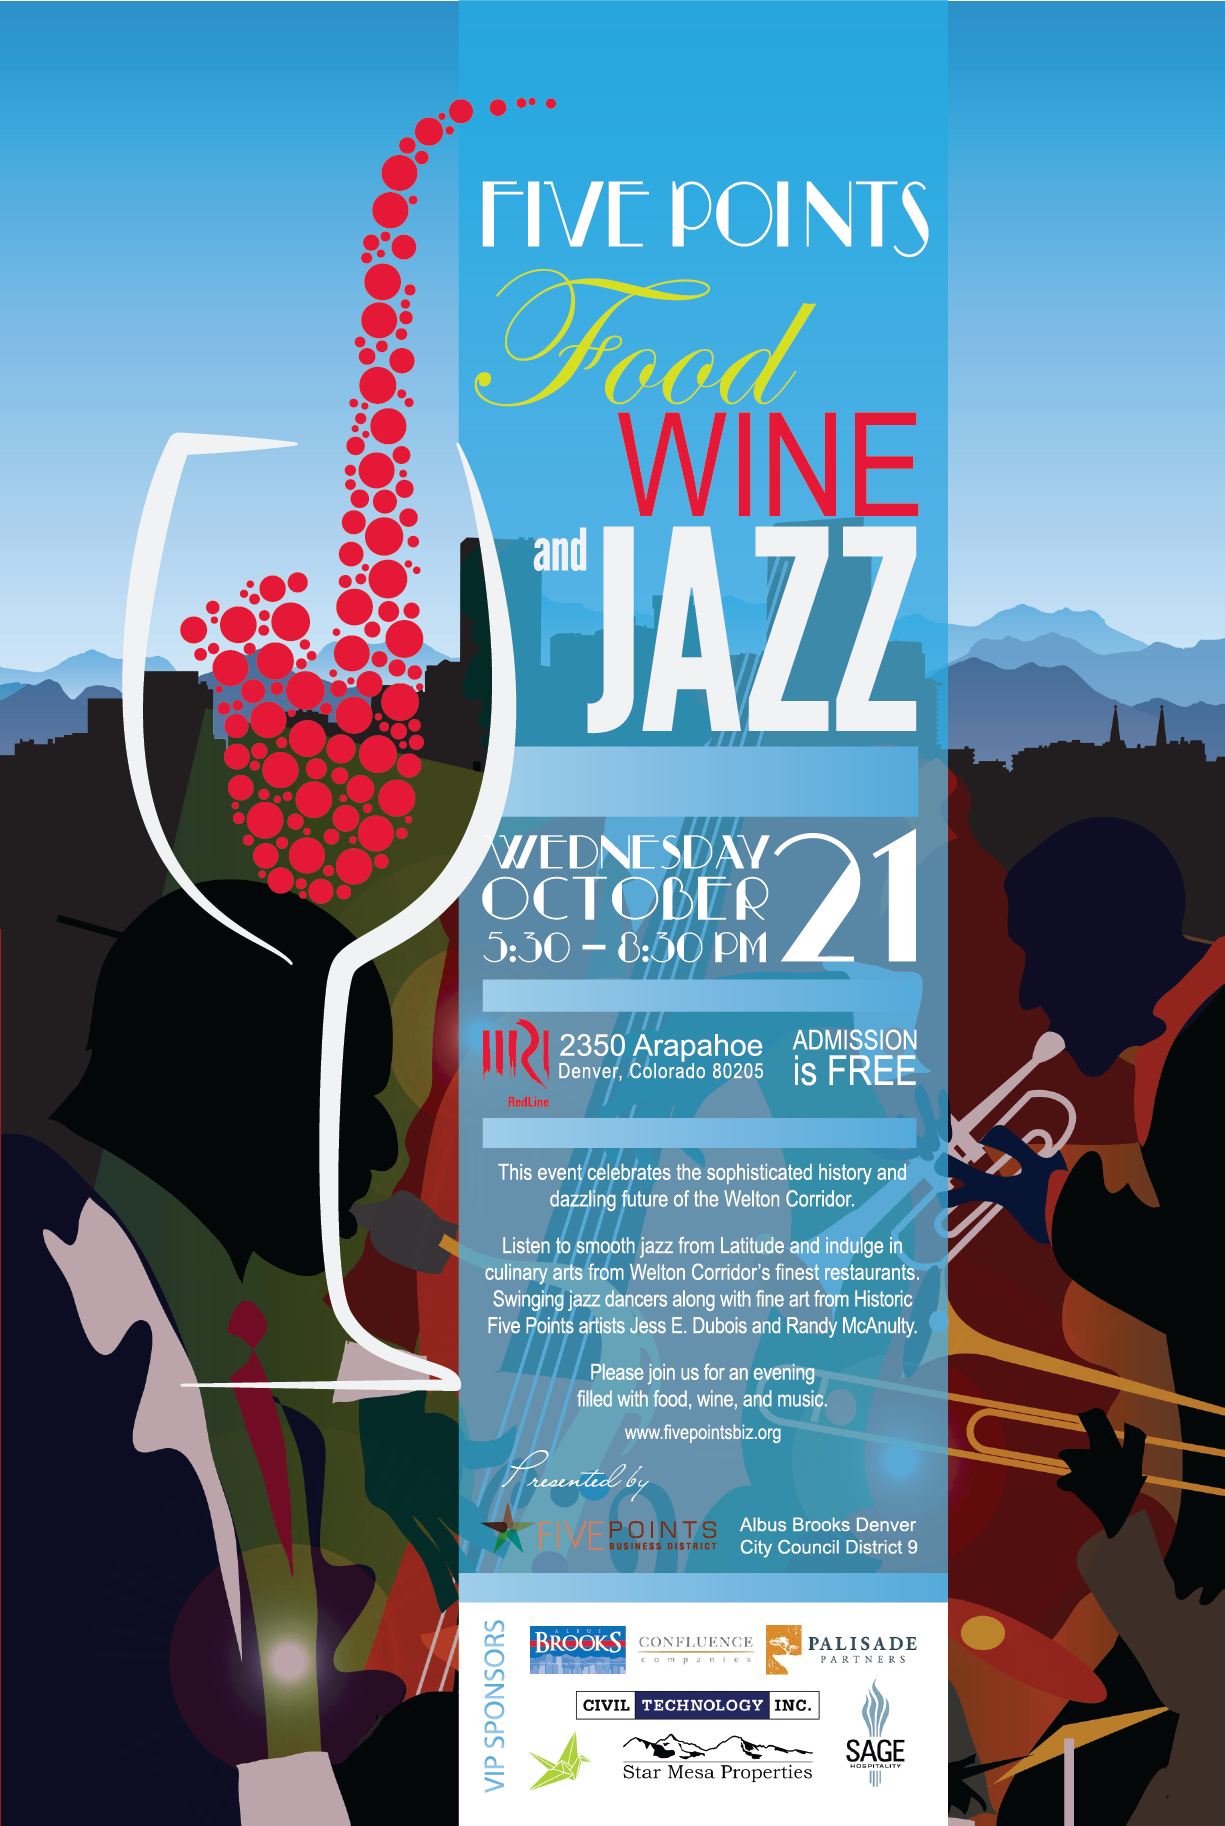 Five Points Food Wine and Jazz @ Redline Gallery | Denver | Colorado | United States